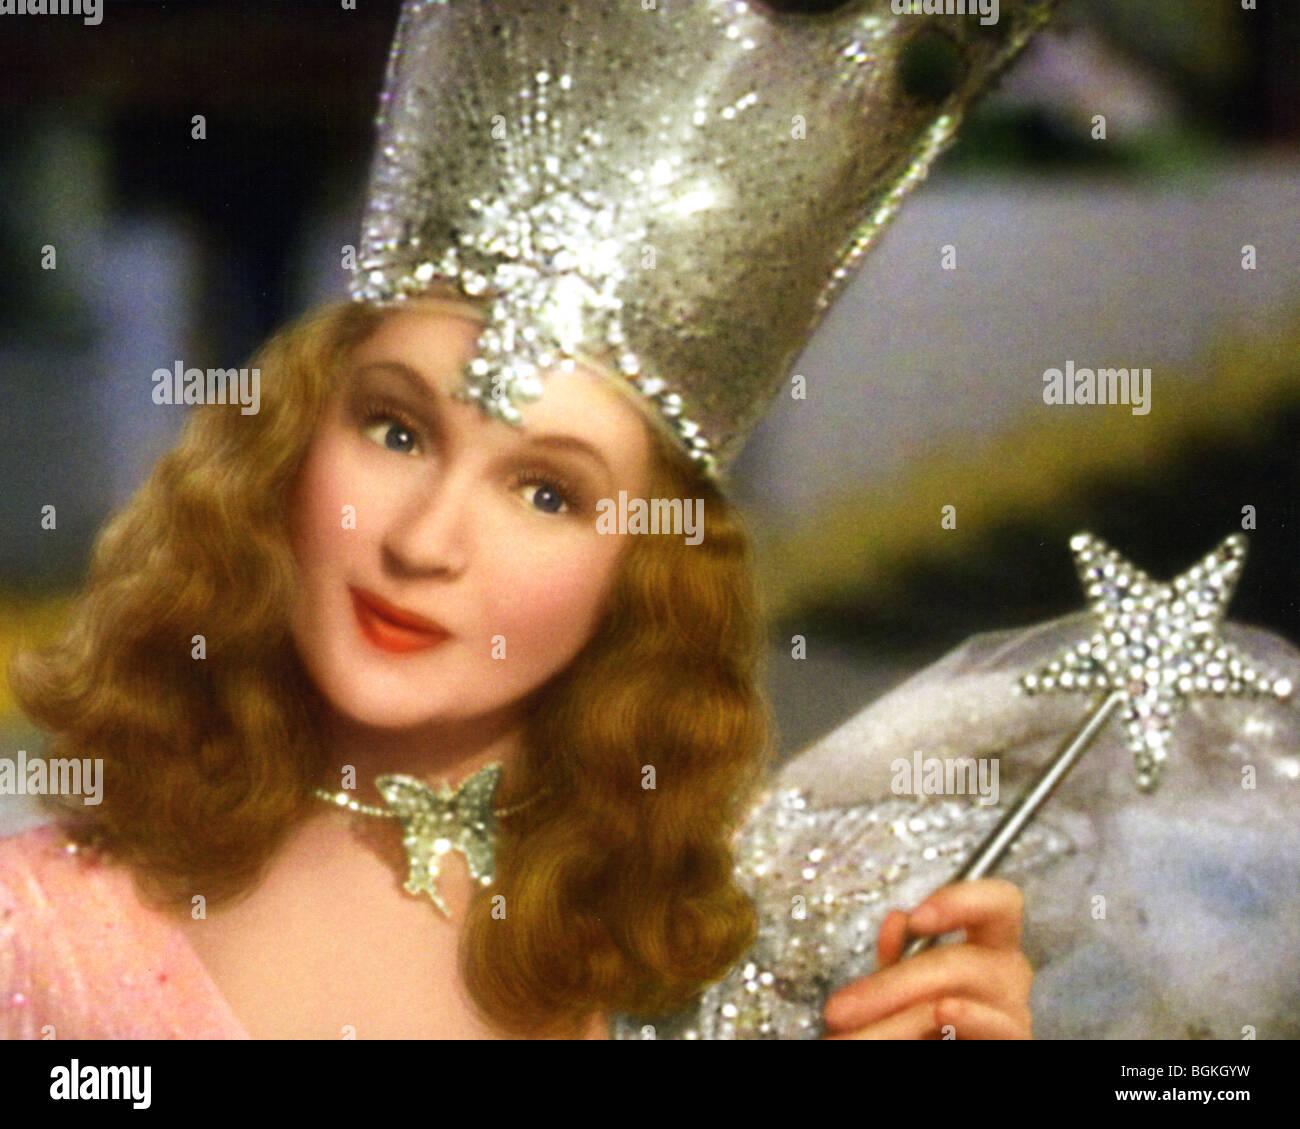 Mary Tamm,Jocelin Donahue Sex movies Jean Carmen,Cherry Pie Picache (b. 1970)